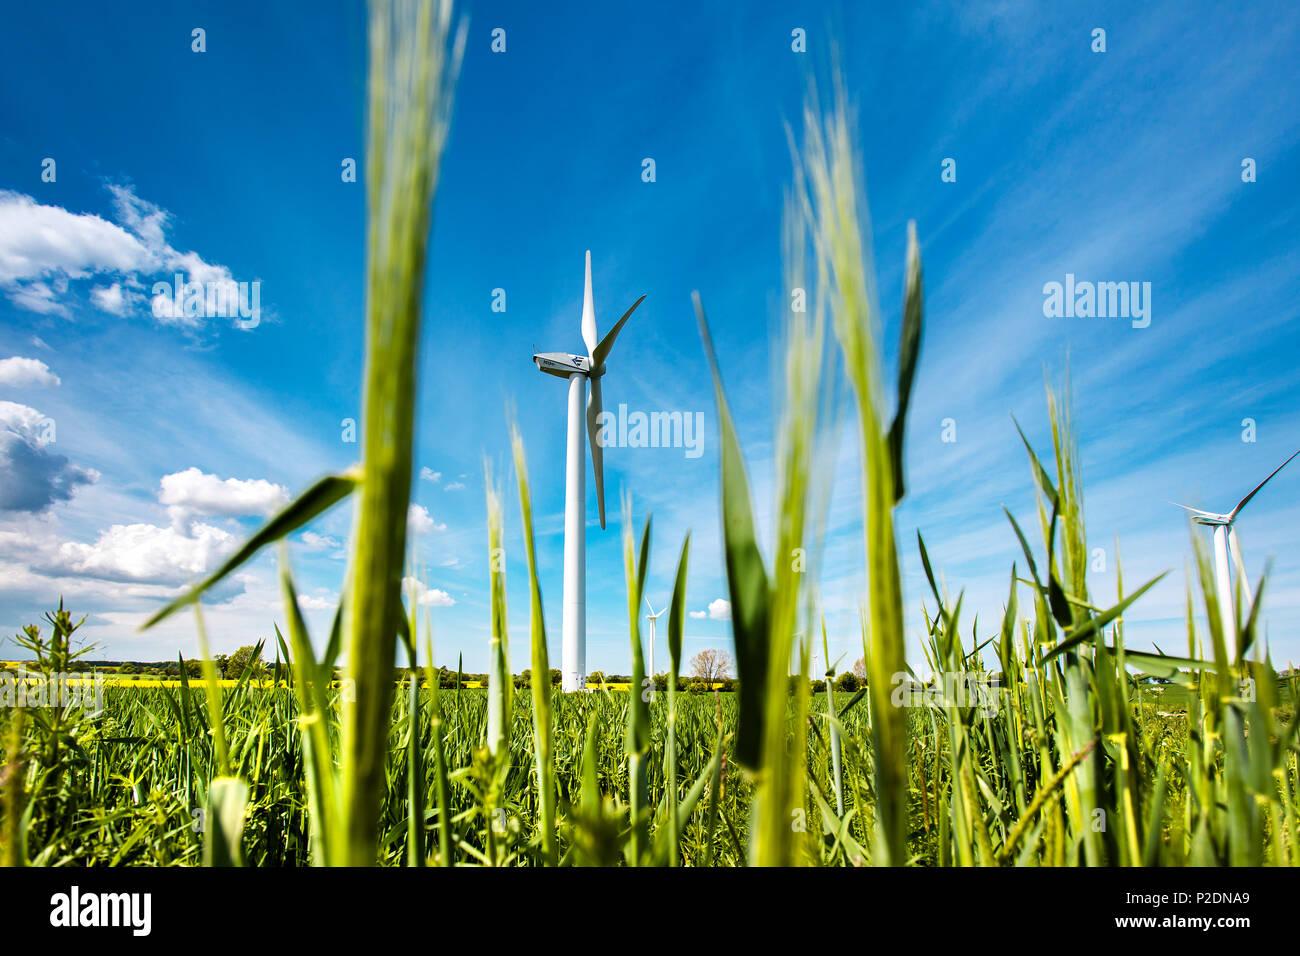 Wind turbine in a field, Baltic Coast, Schleswig-Holstein, Germany - Stock Image